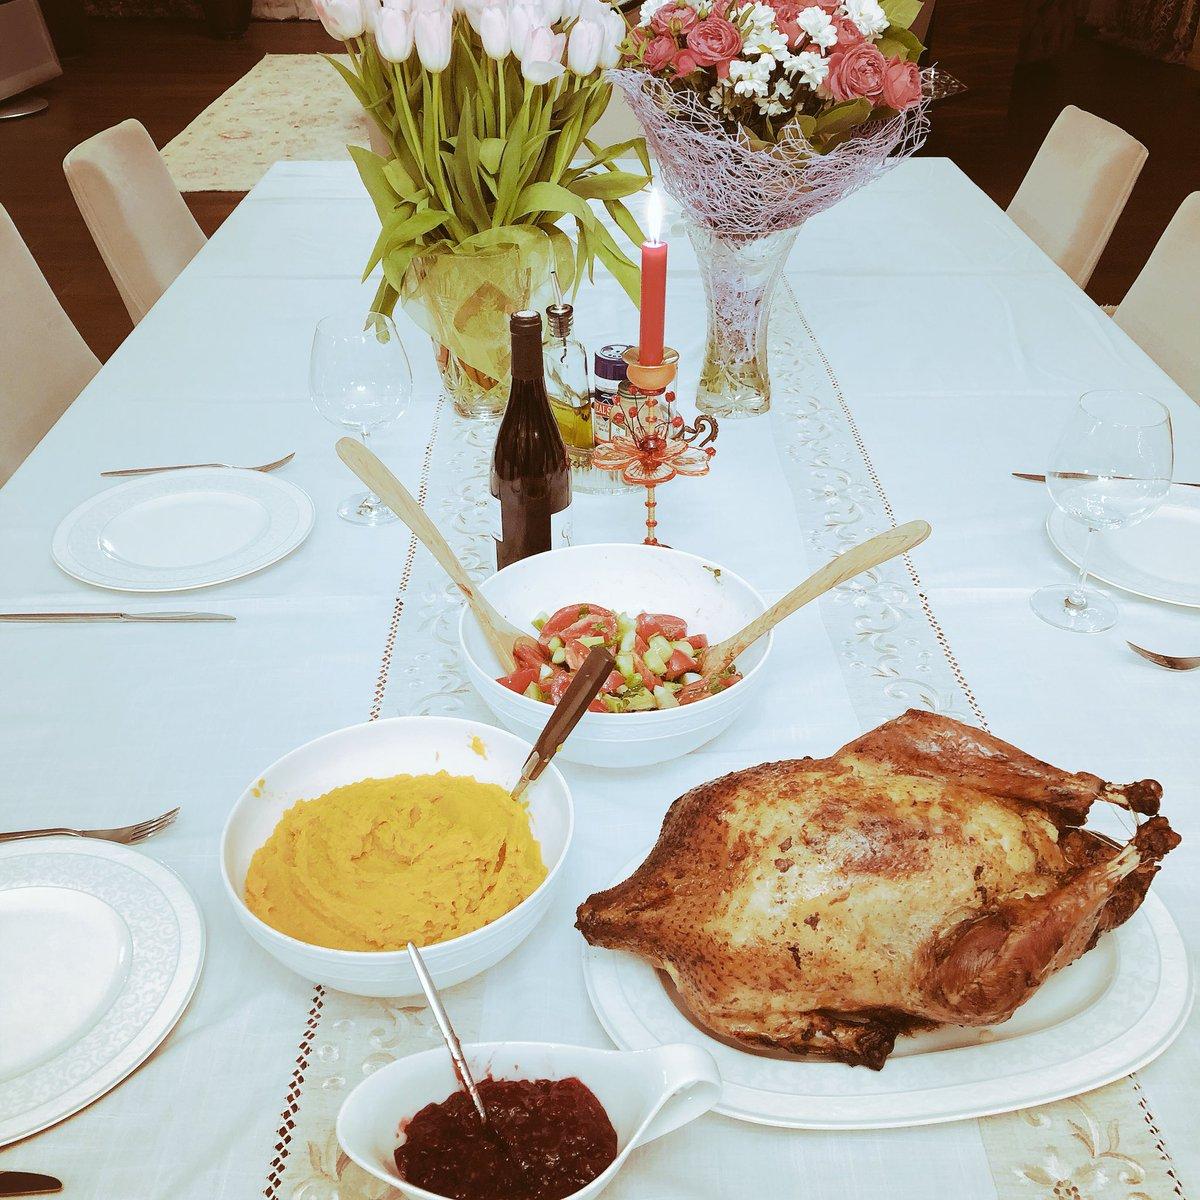 Пришла домой, а тут #Thanksgiving #спасибовсем #thankyouall https://t.co/2LP56Cvvbm